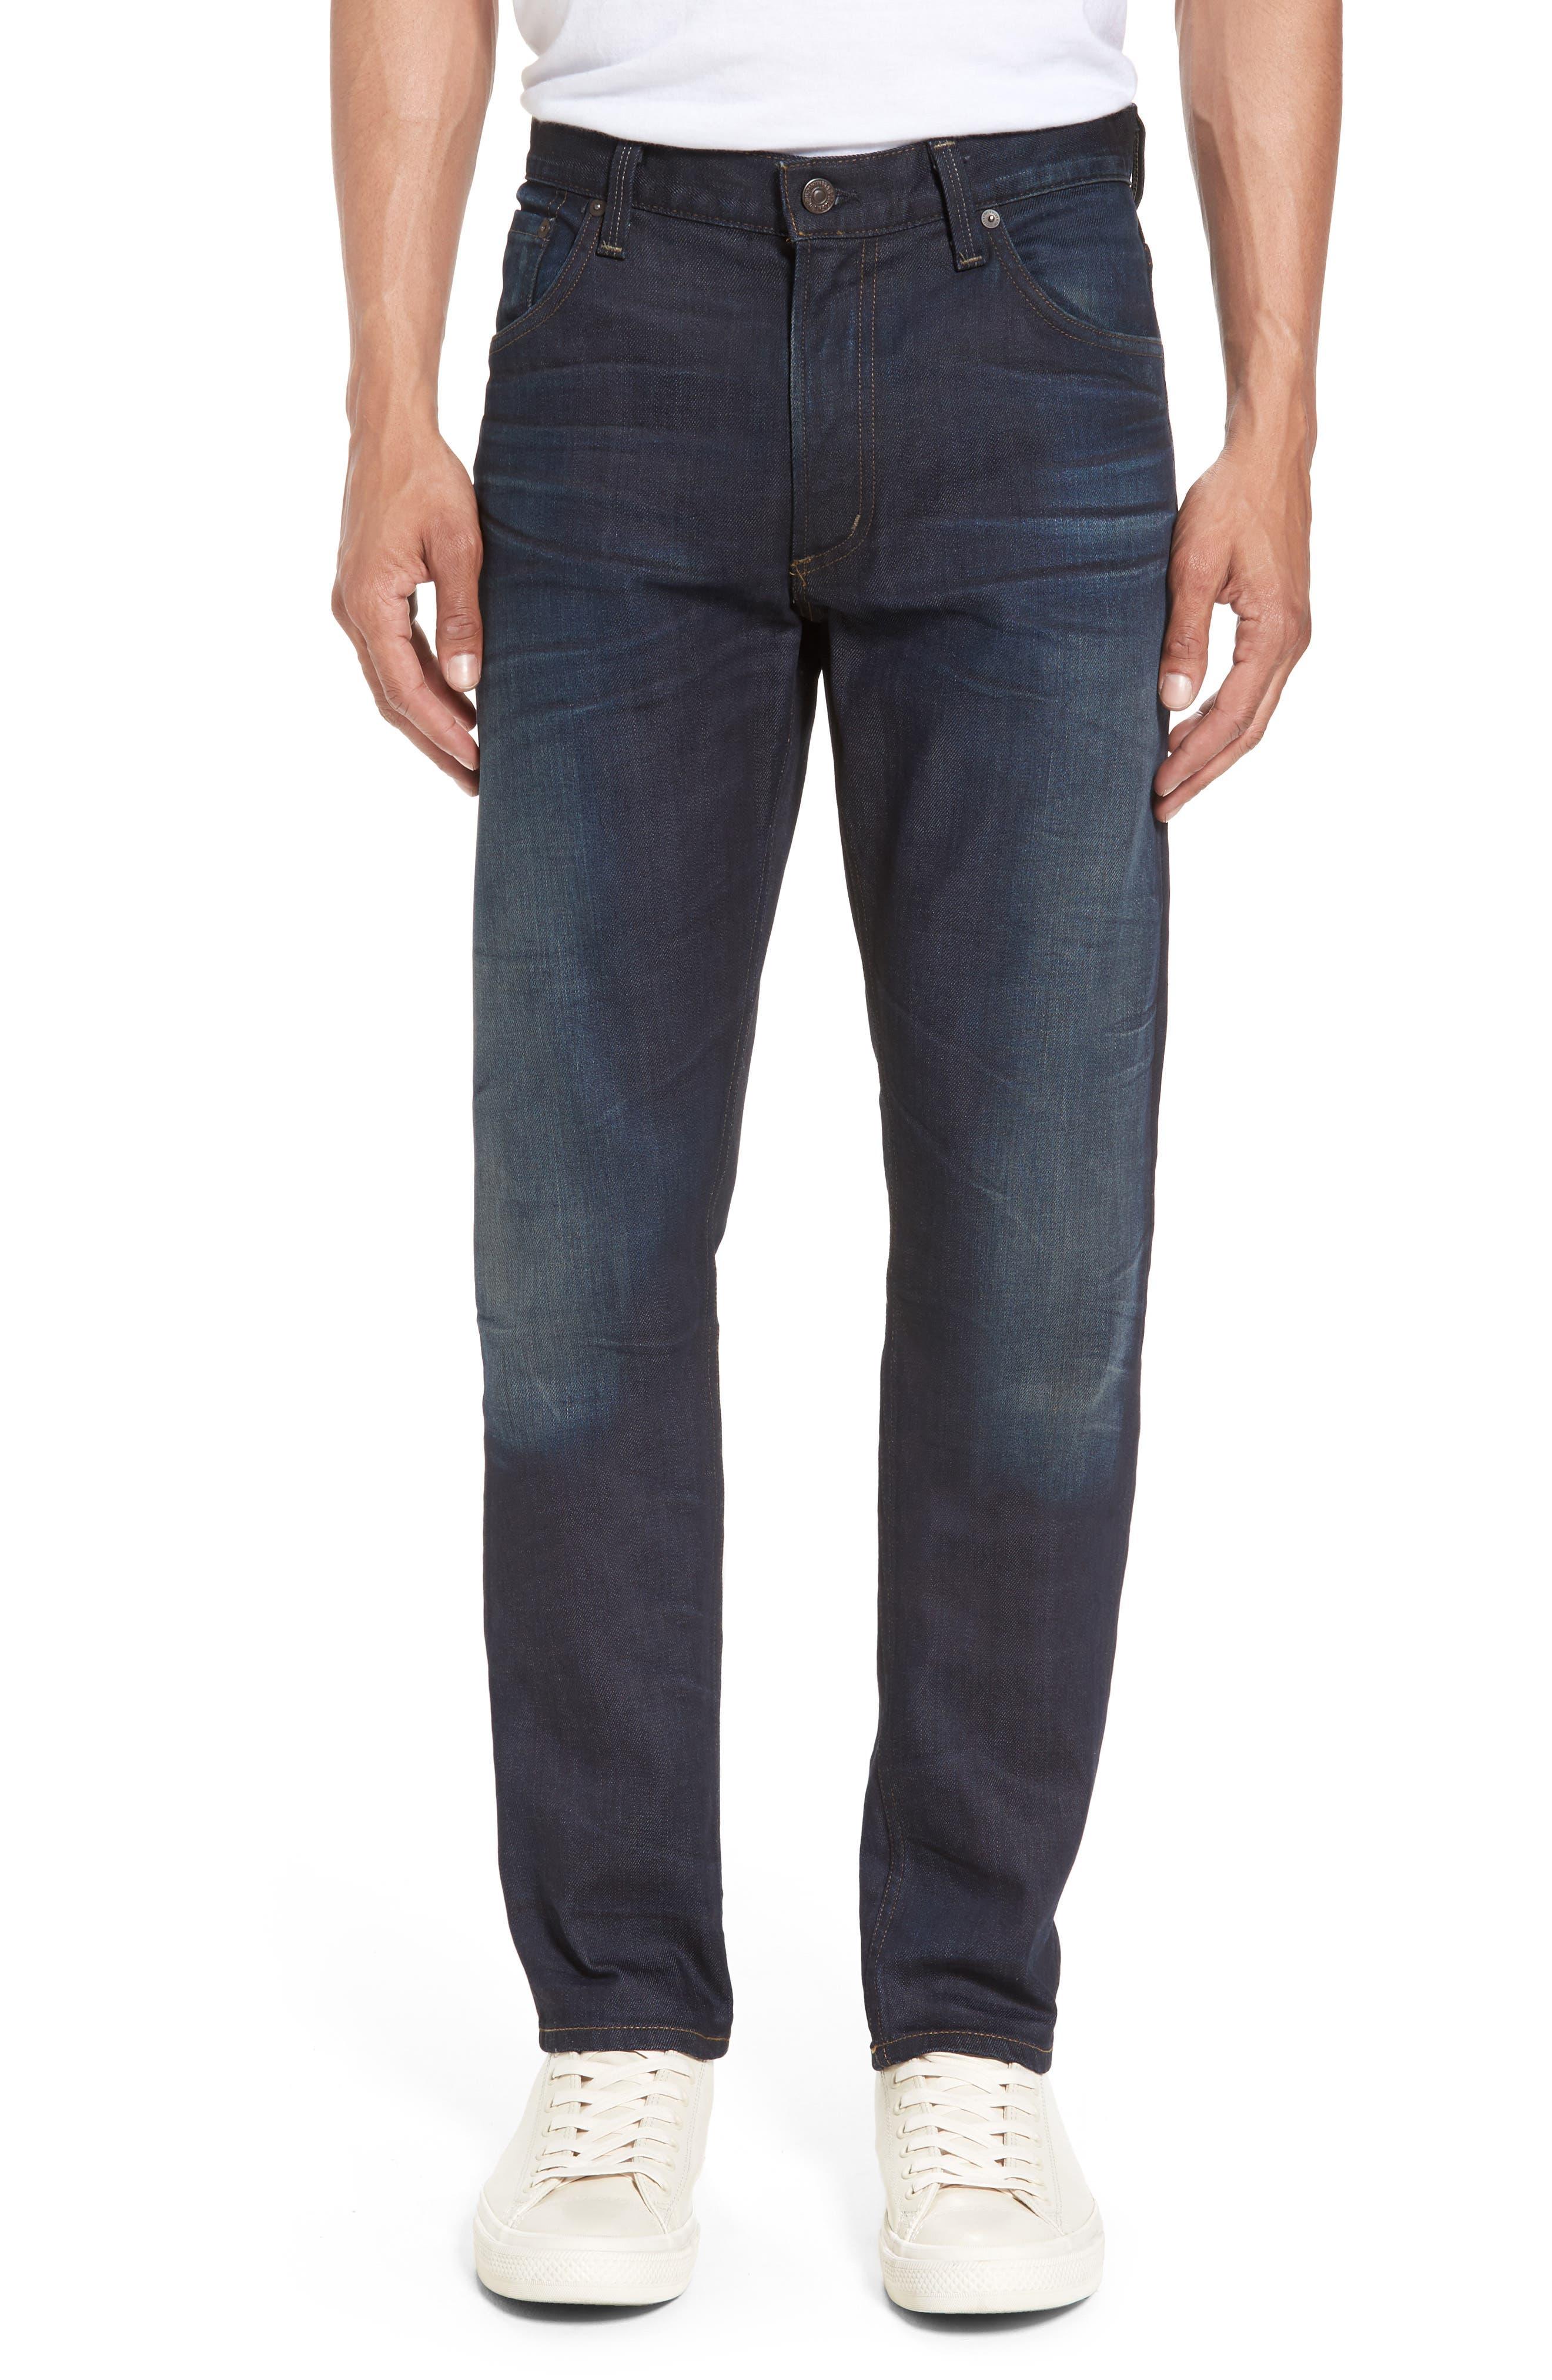 Bowery Slim Fit Jeans,                             Main thumbnail 1, color,                             HURON